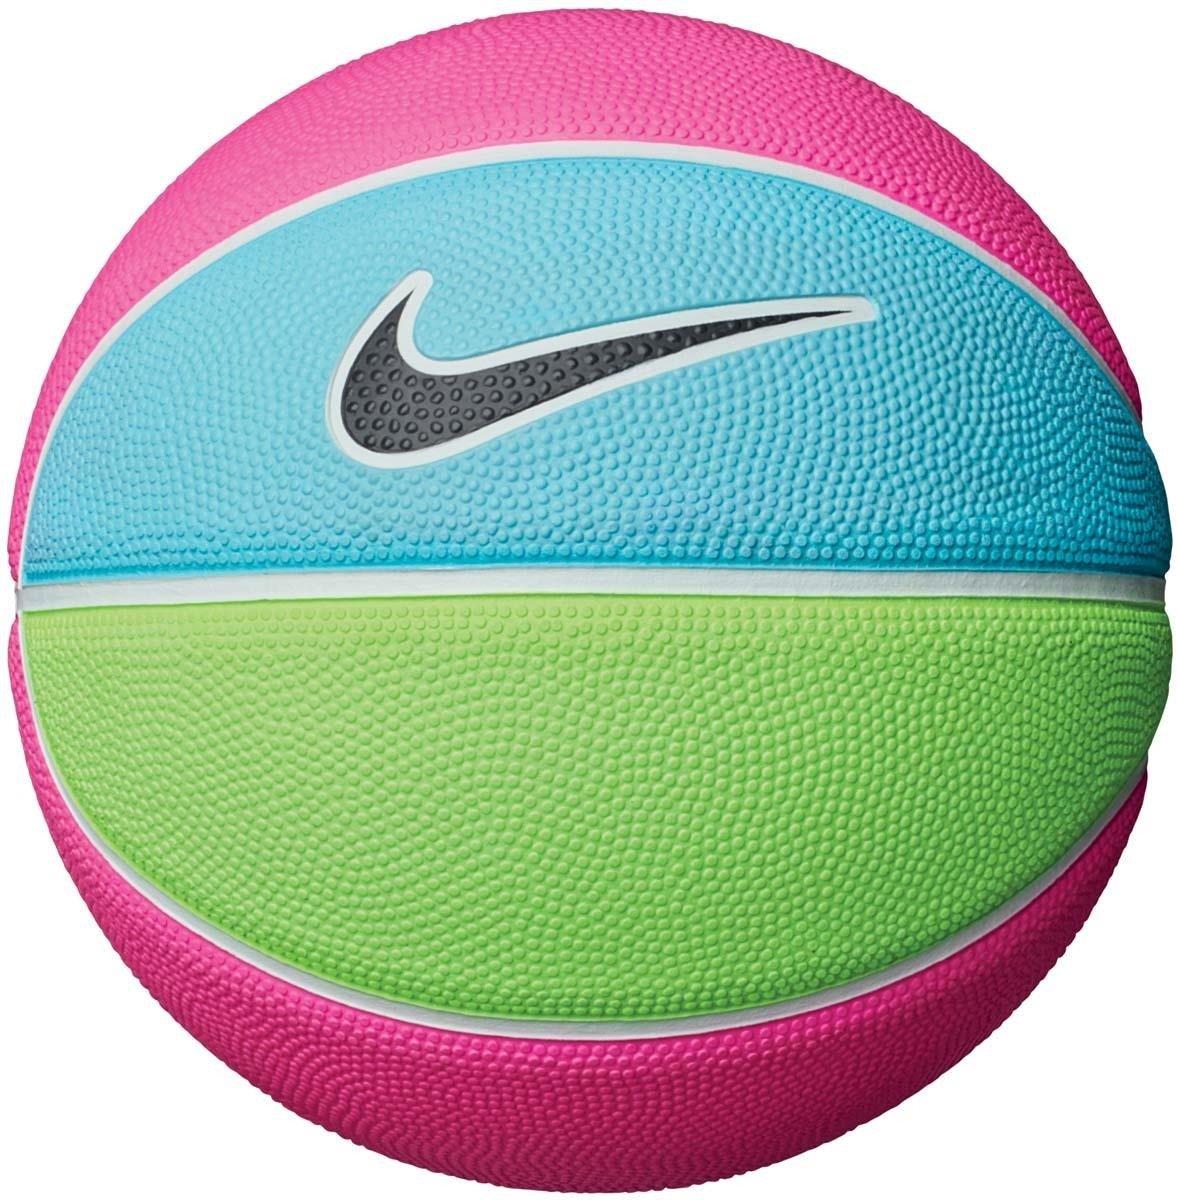 buy online 3de27 73def Piłka do koszykówki Nike Skills (3) - N000128540603